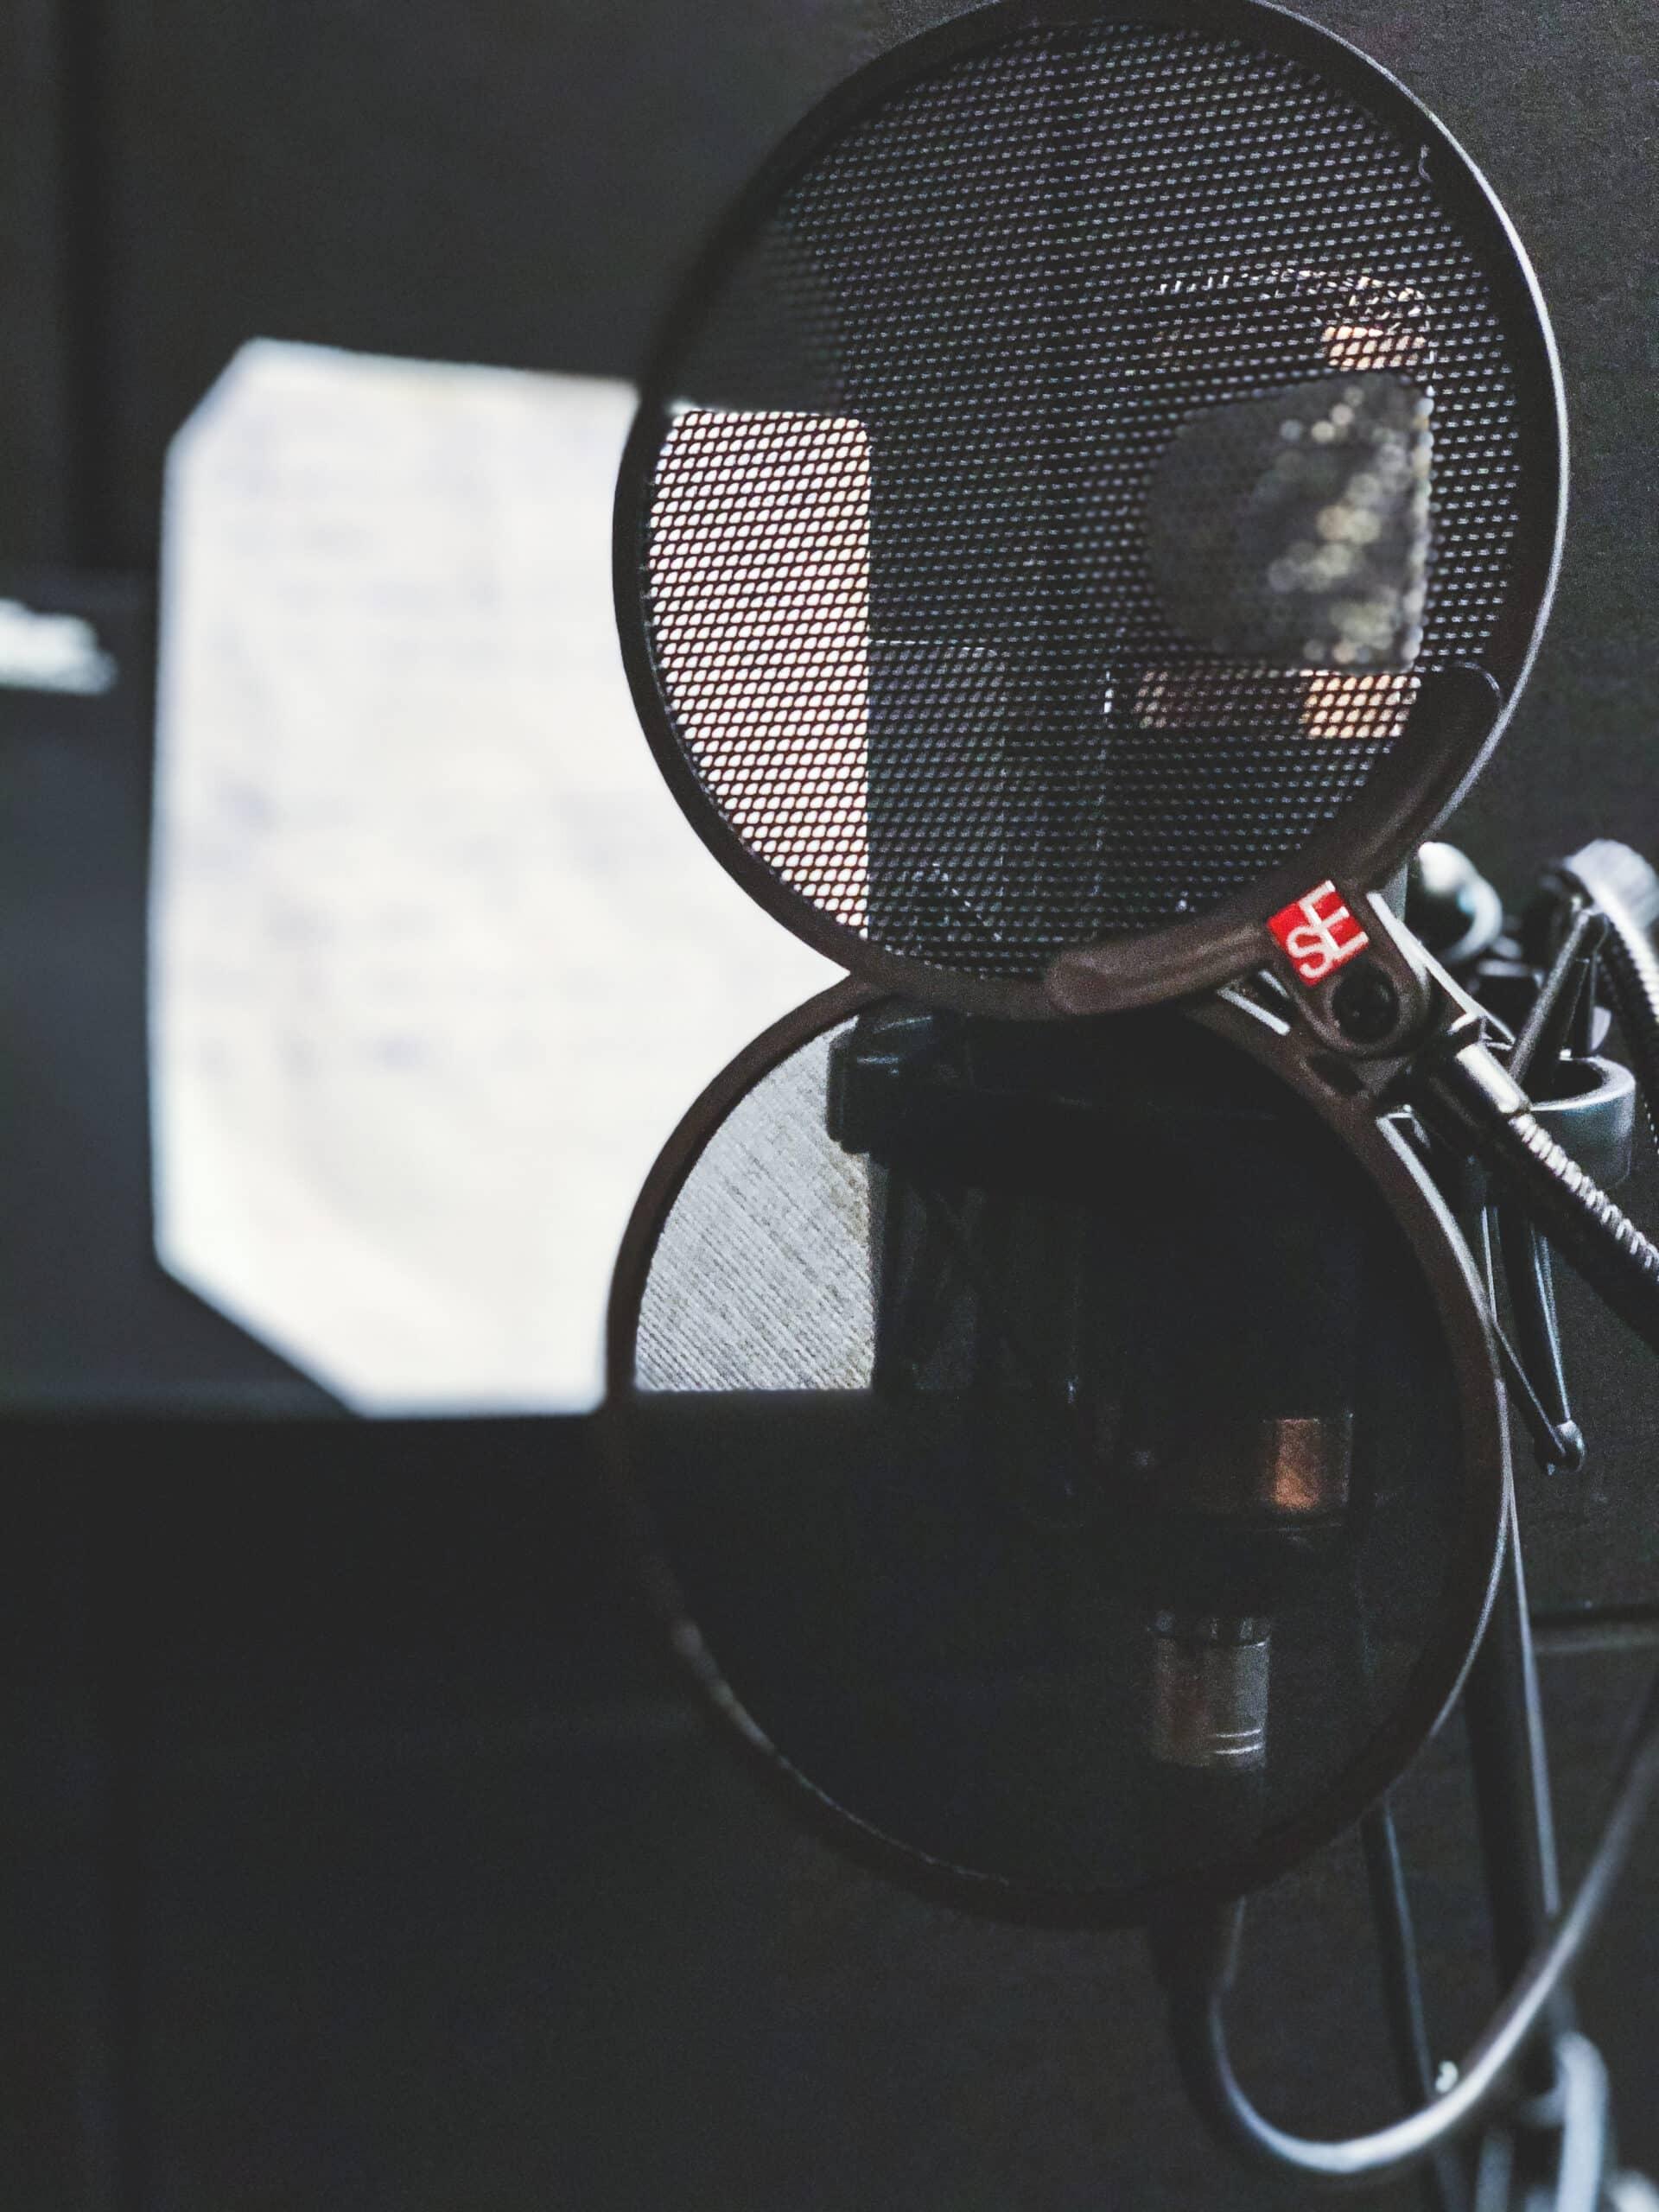 Mikrofon w studio nagraniowym Architected Sound